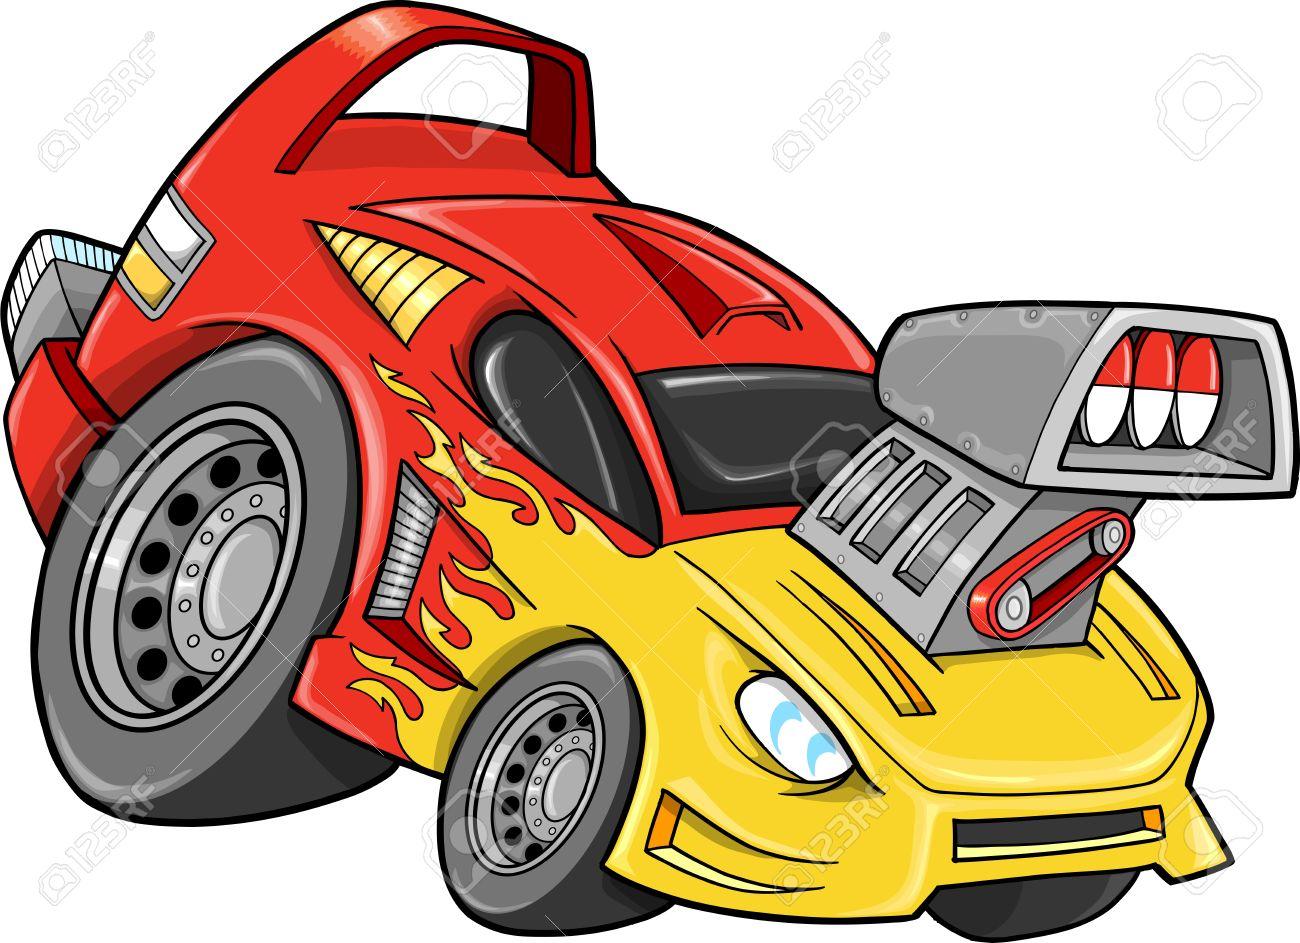 Race Car Street Car Vehicle Vector Illustration art - 12748928